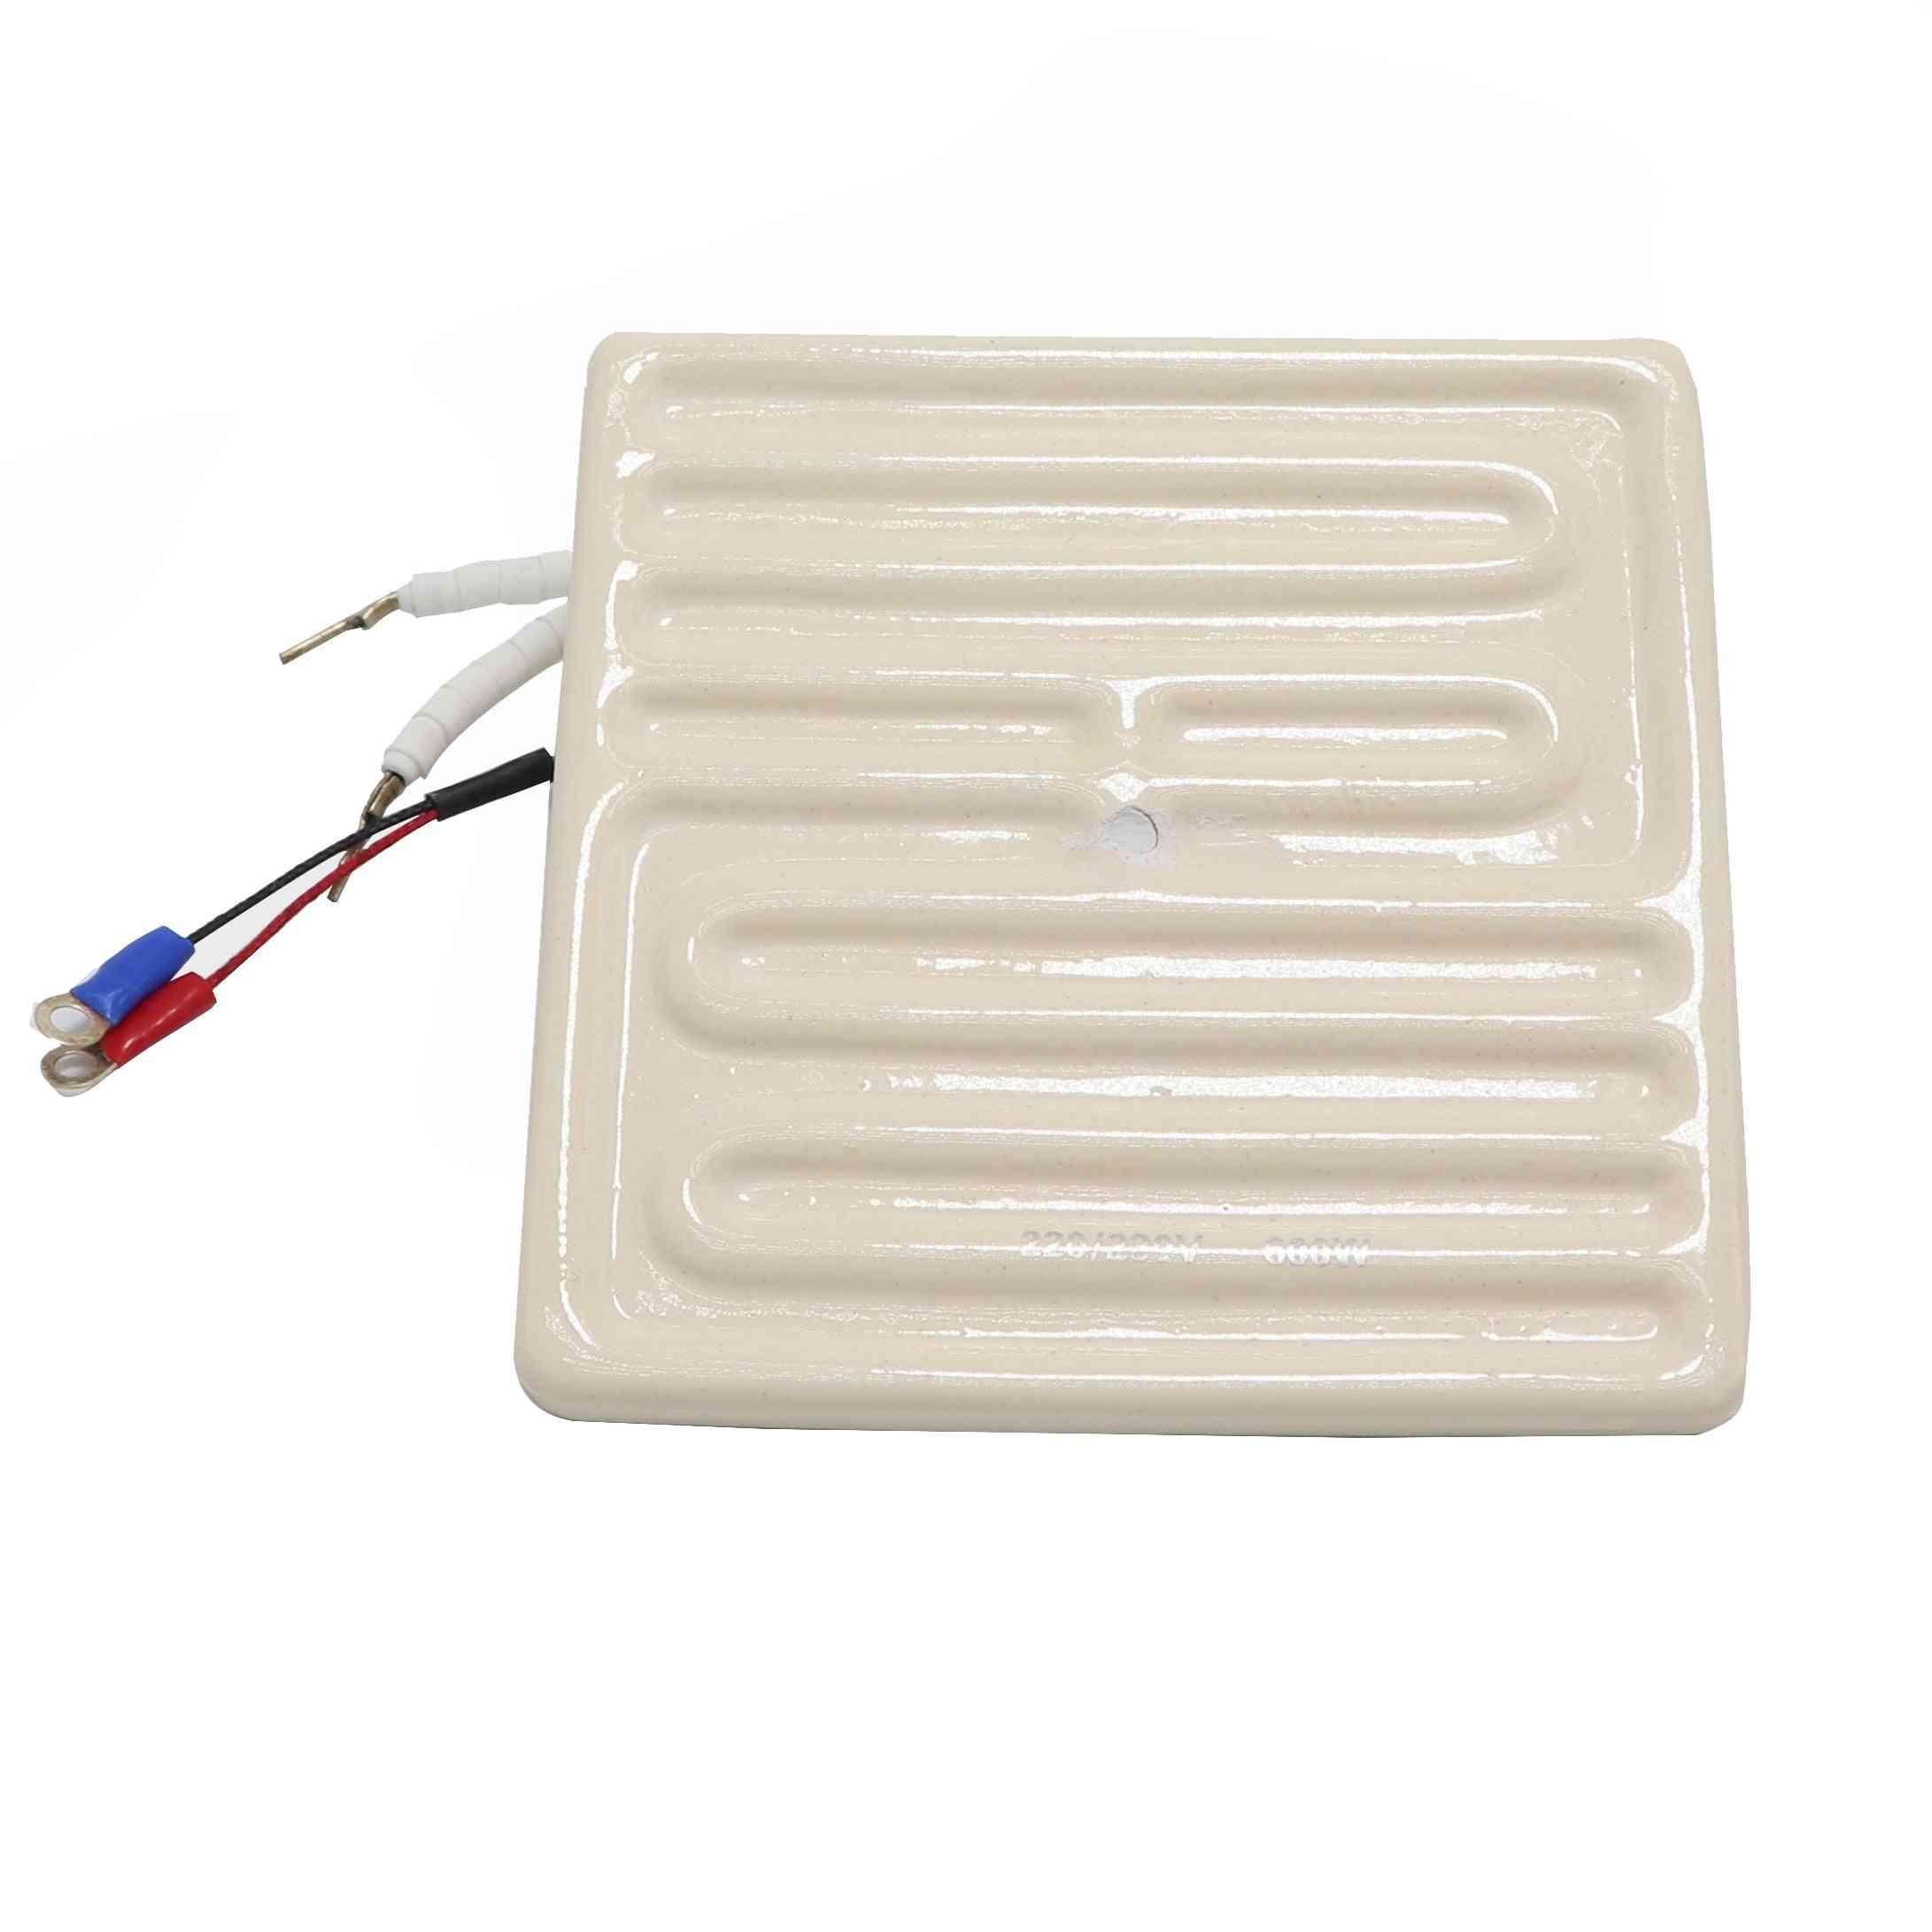 Heating Plate Far Infrared Ceramic Heating Brick